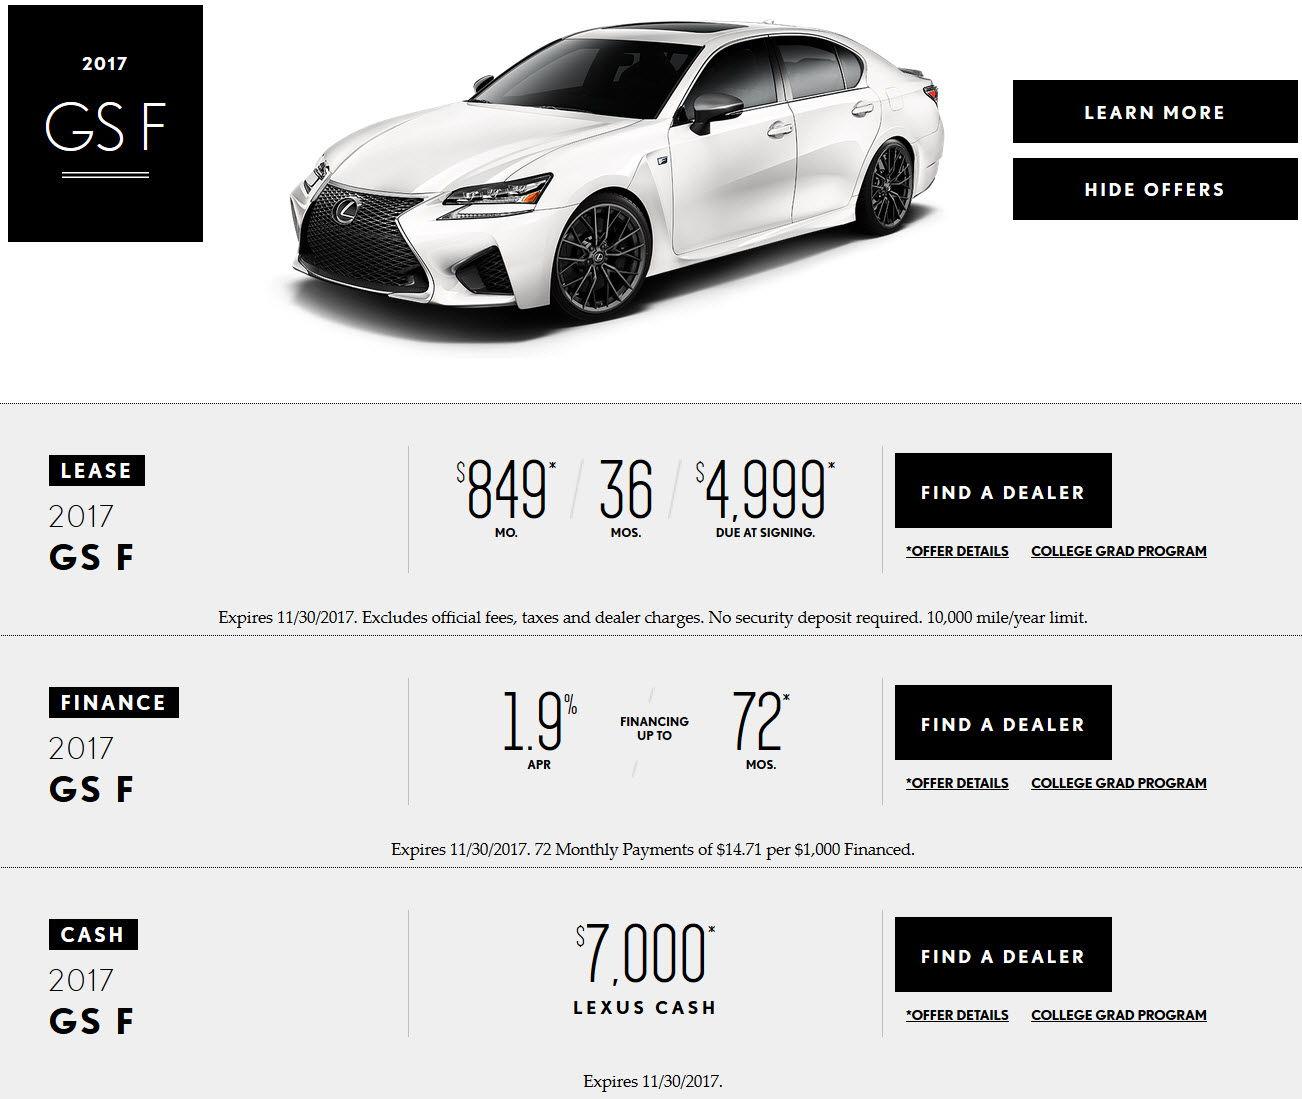 Lexus Gs Lease: GS-F Lease Special Now $849